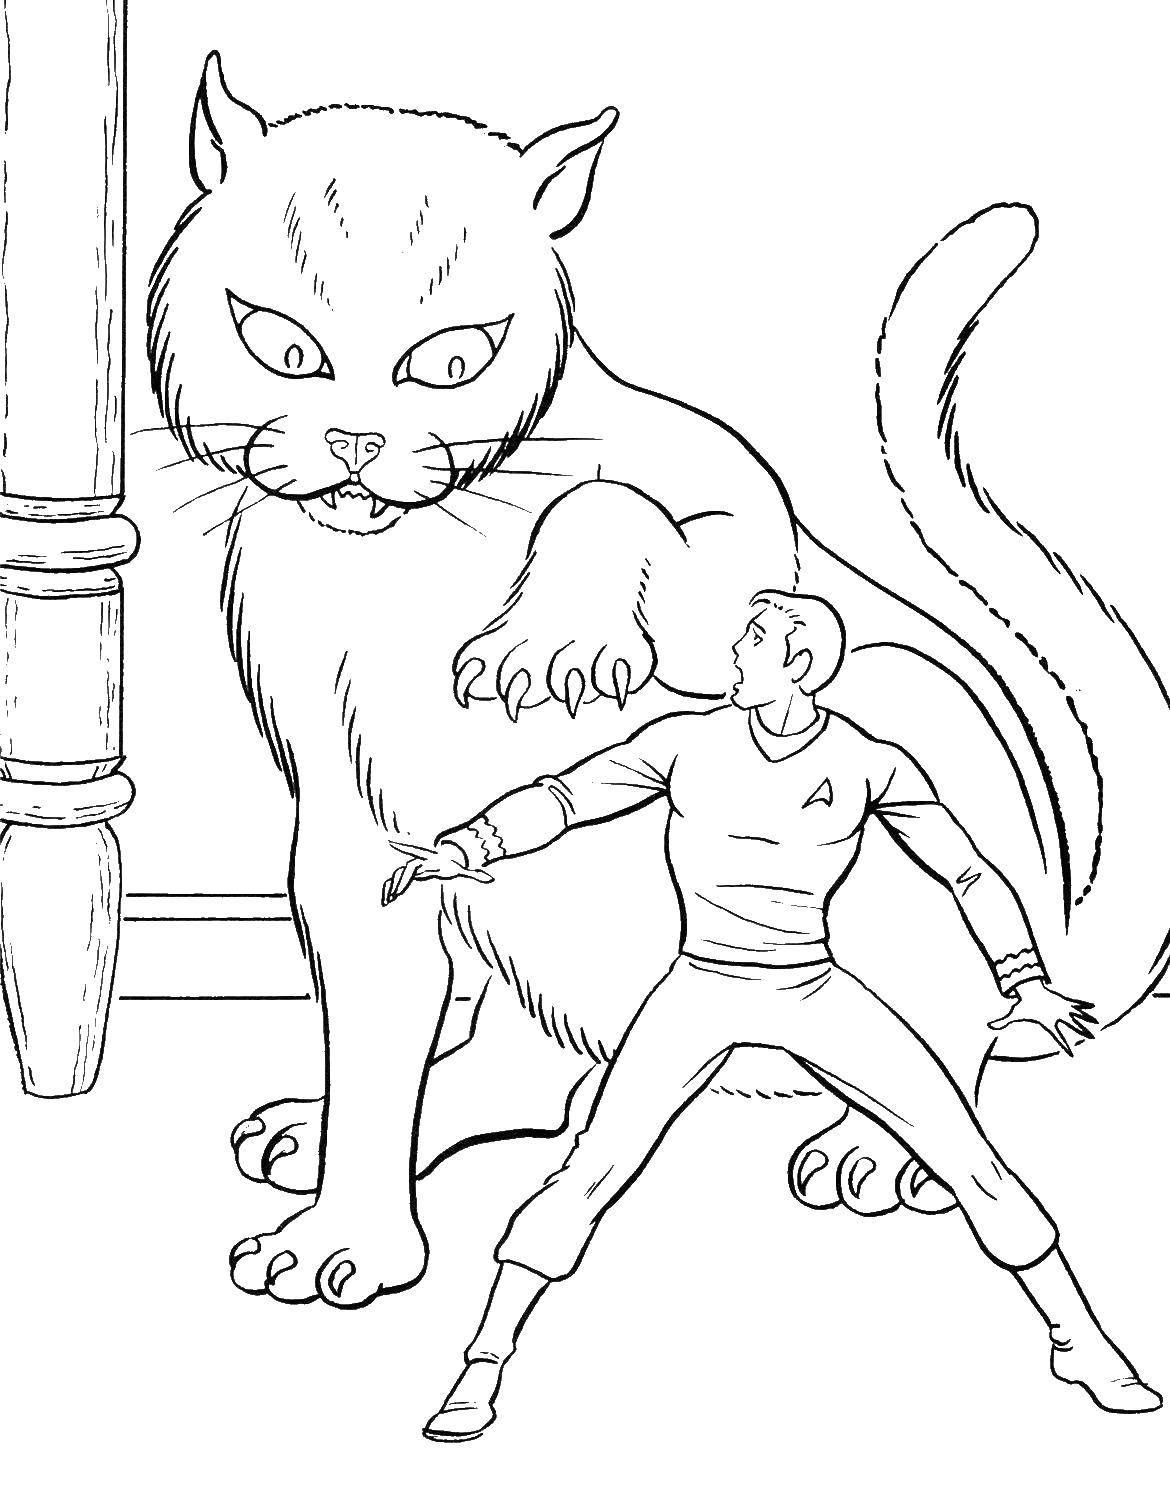 Большой кот напал на человека